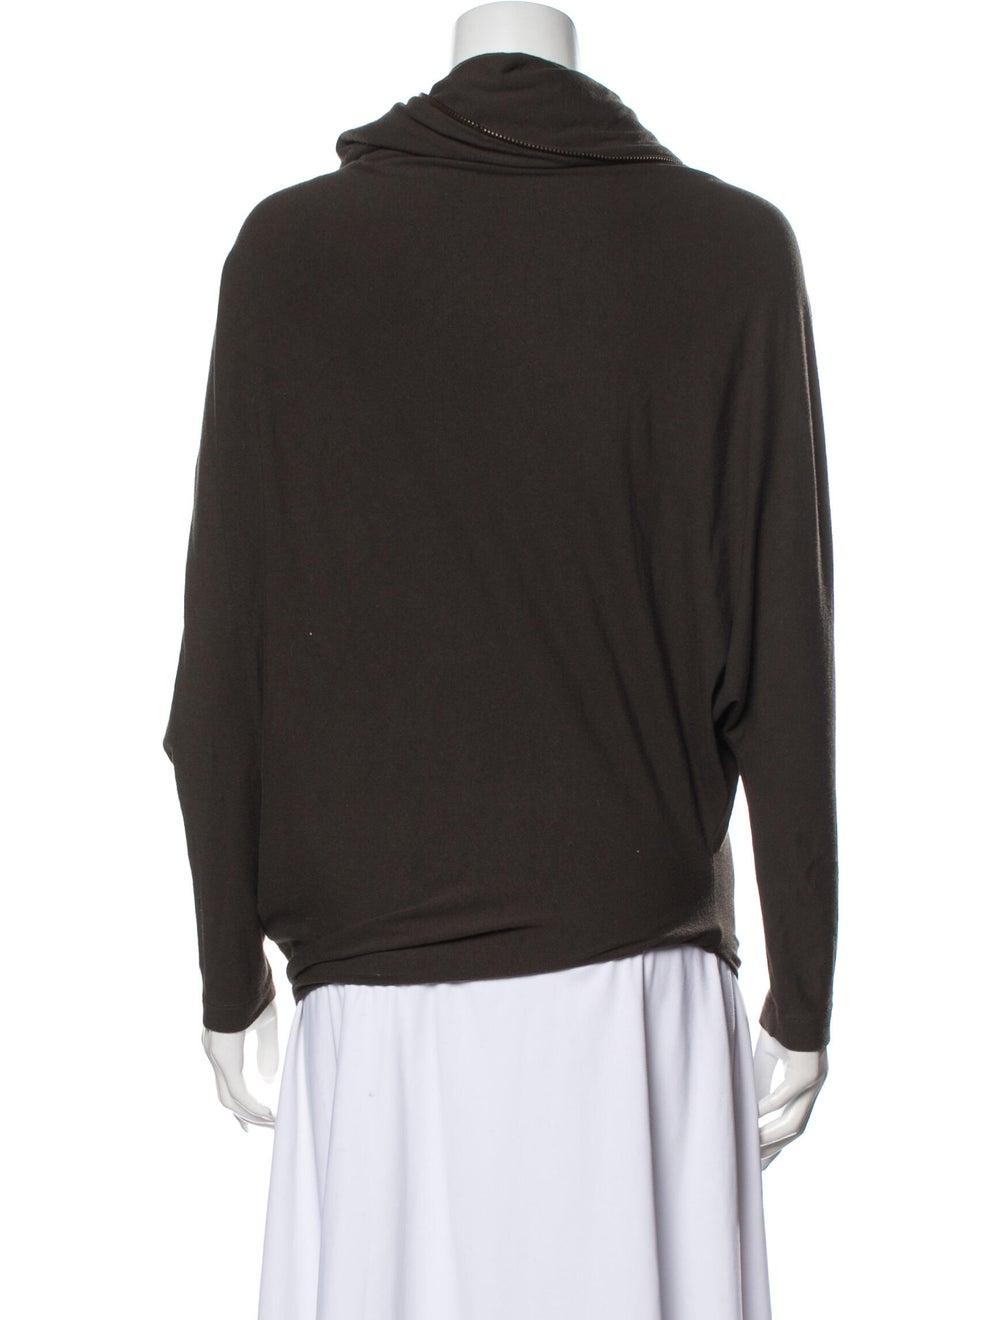 Plein Sud Cowl Neck Sweater Green - image 3